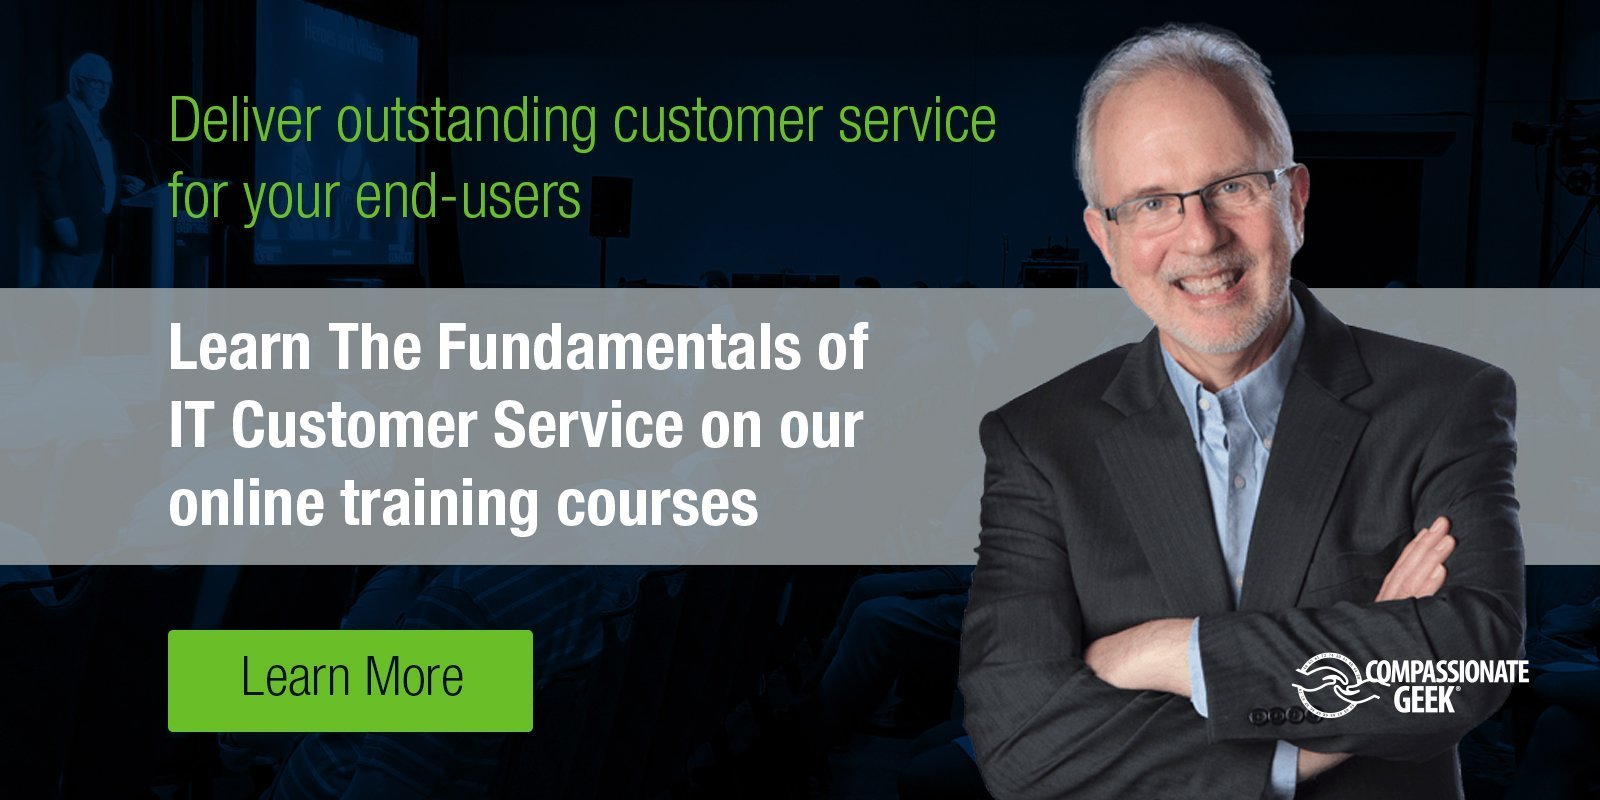 The Fundamentals of IT Customer Service CTA